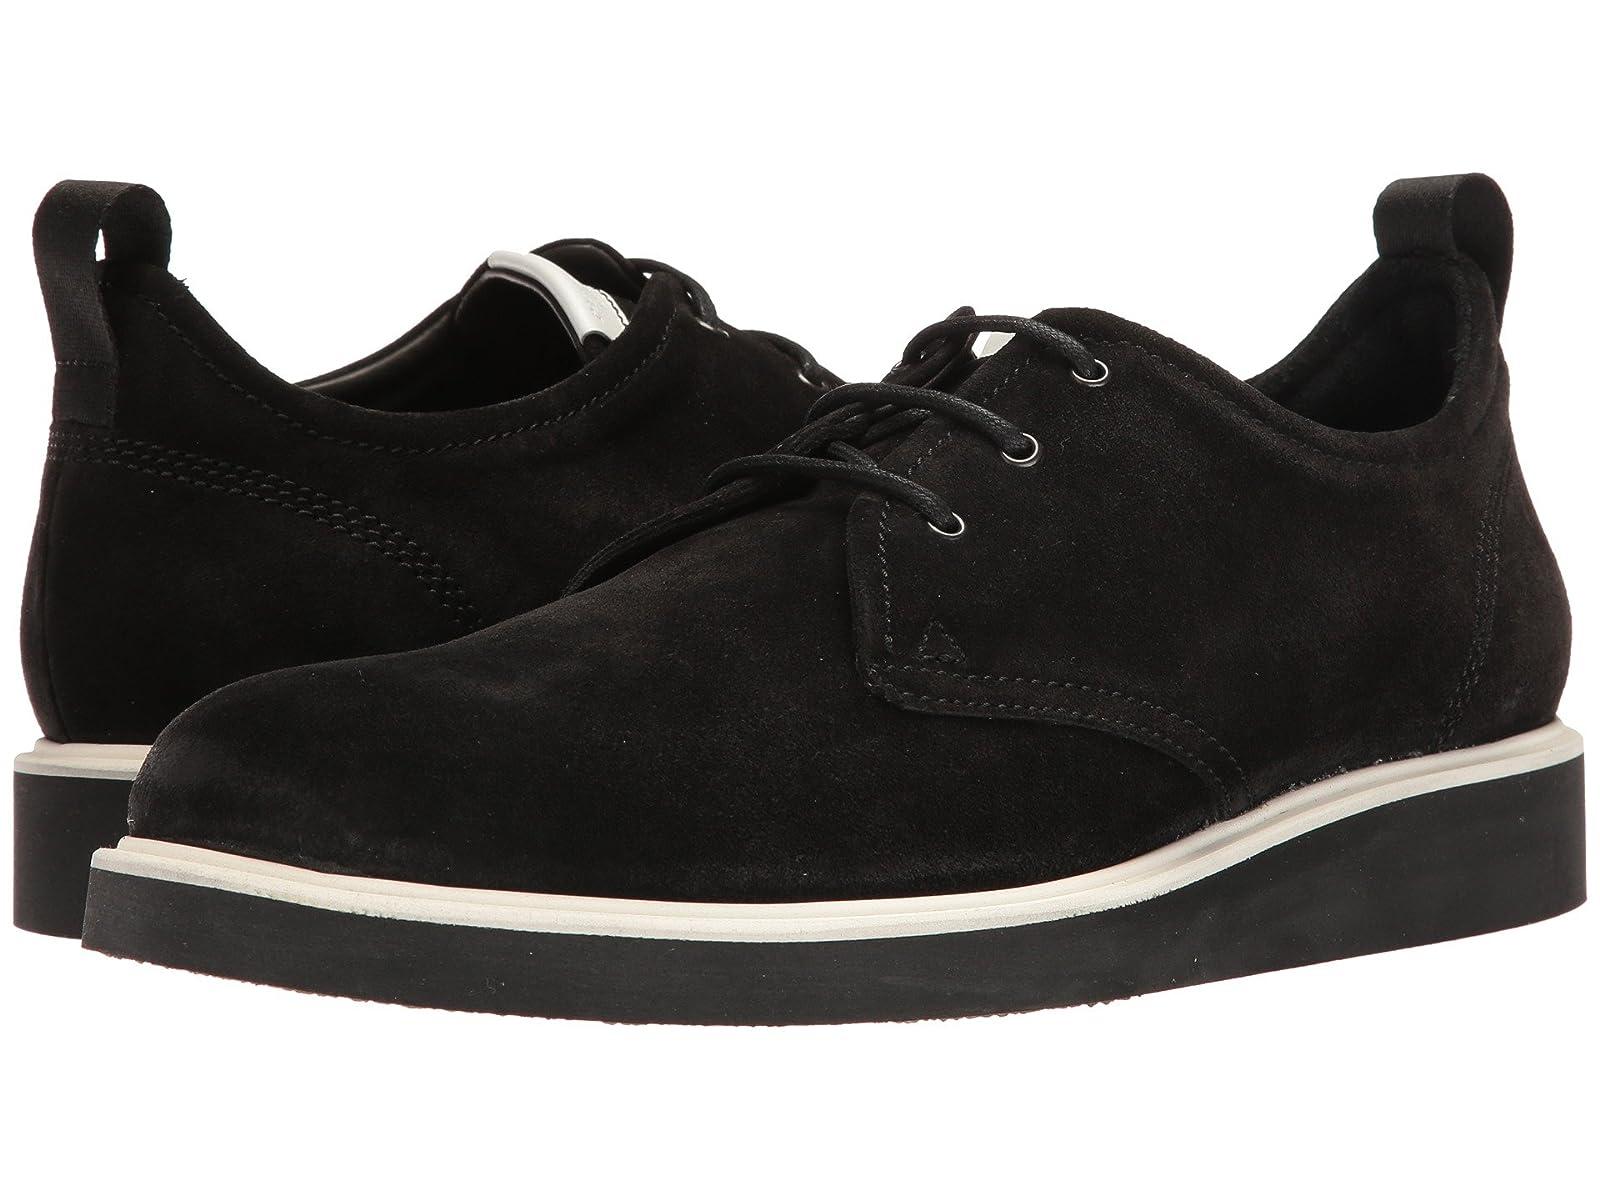 rag & bone Elliot OxfordCheap and distinctive eye-catching shoes